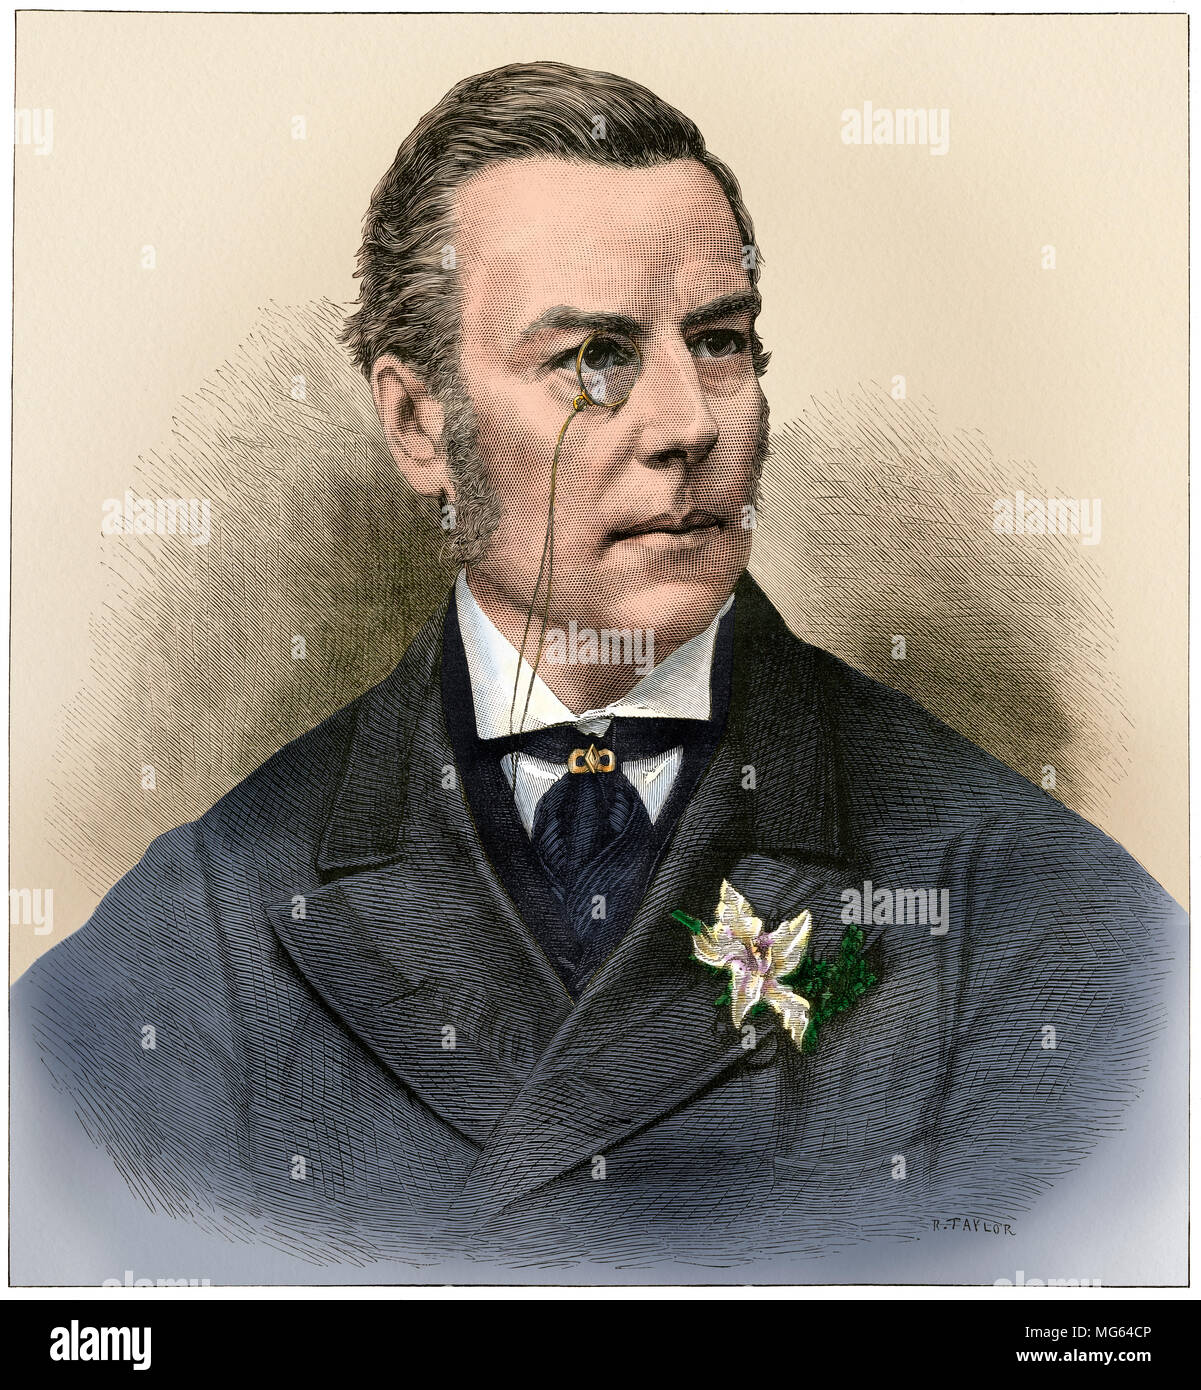 Joseph Chamberlain, British statesman, 1880s. Digitally colored woodcut - Stock Image